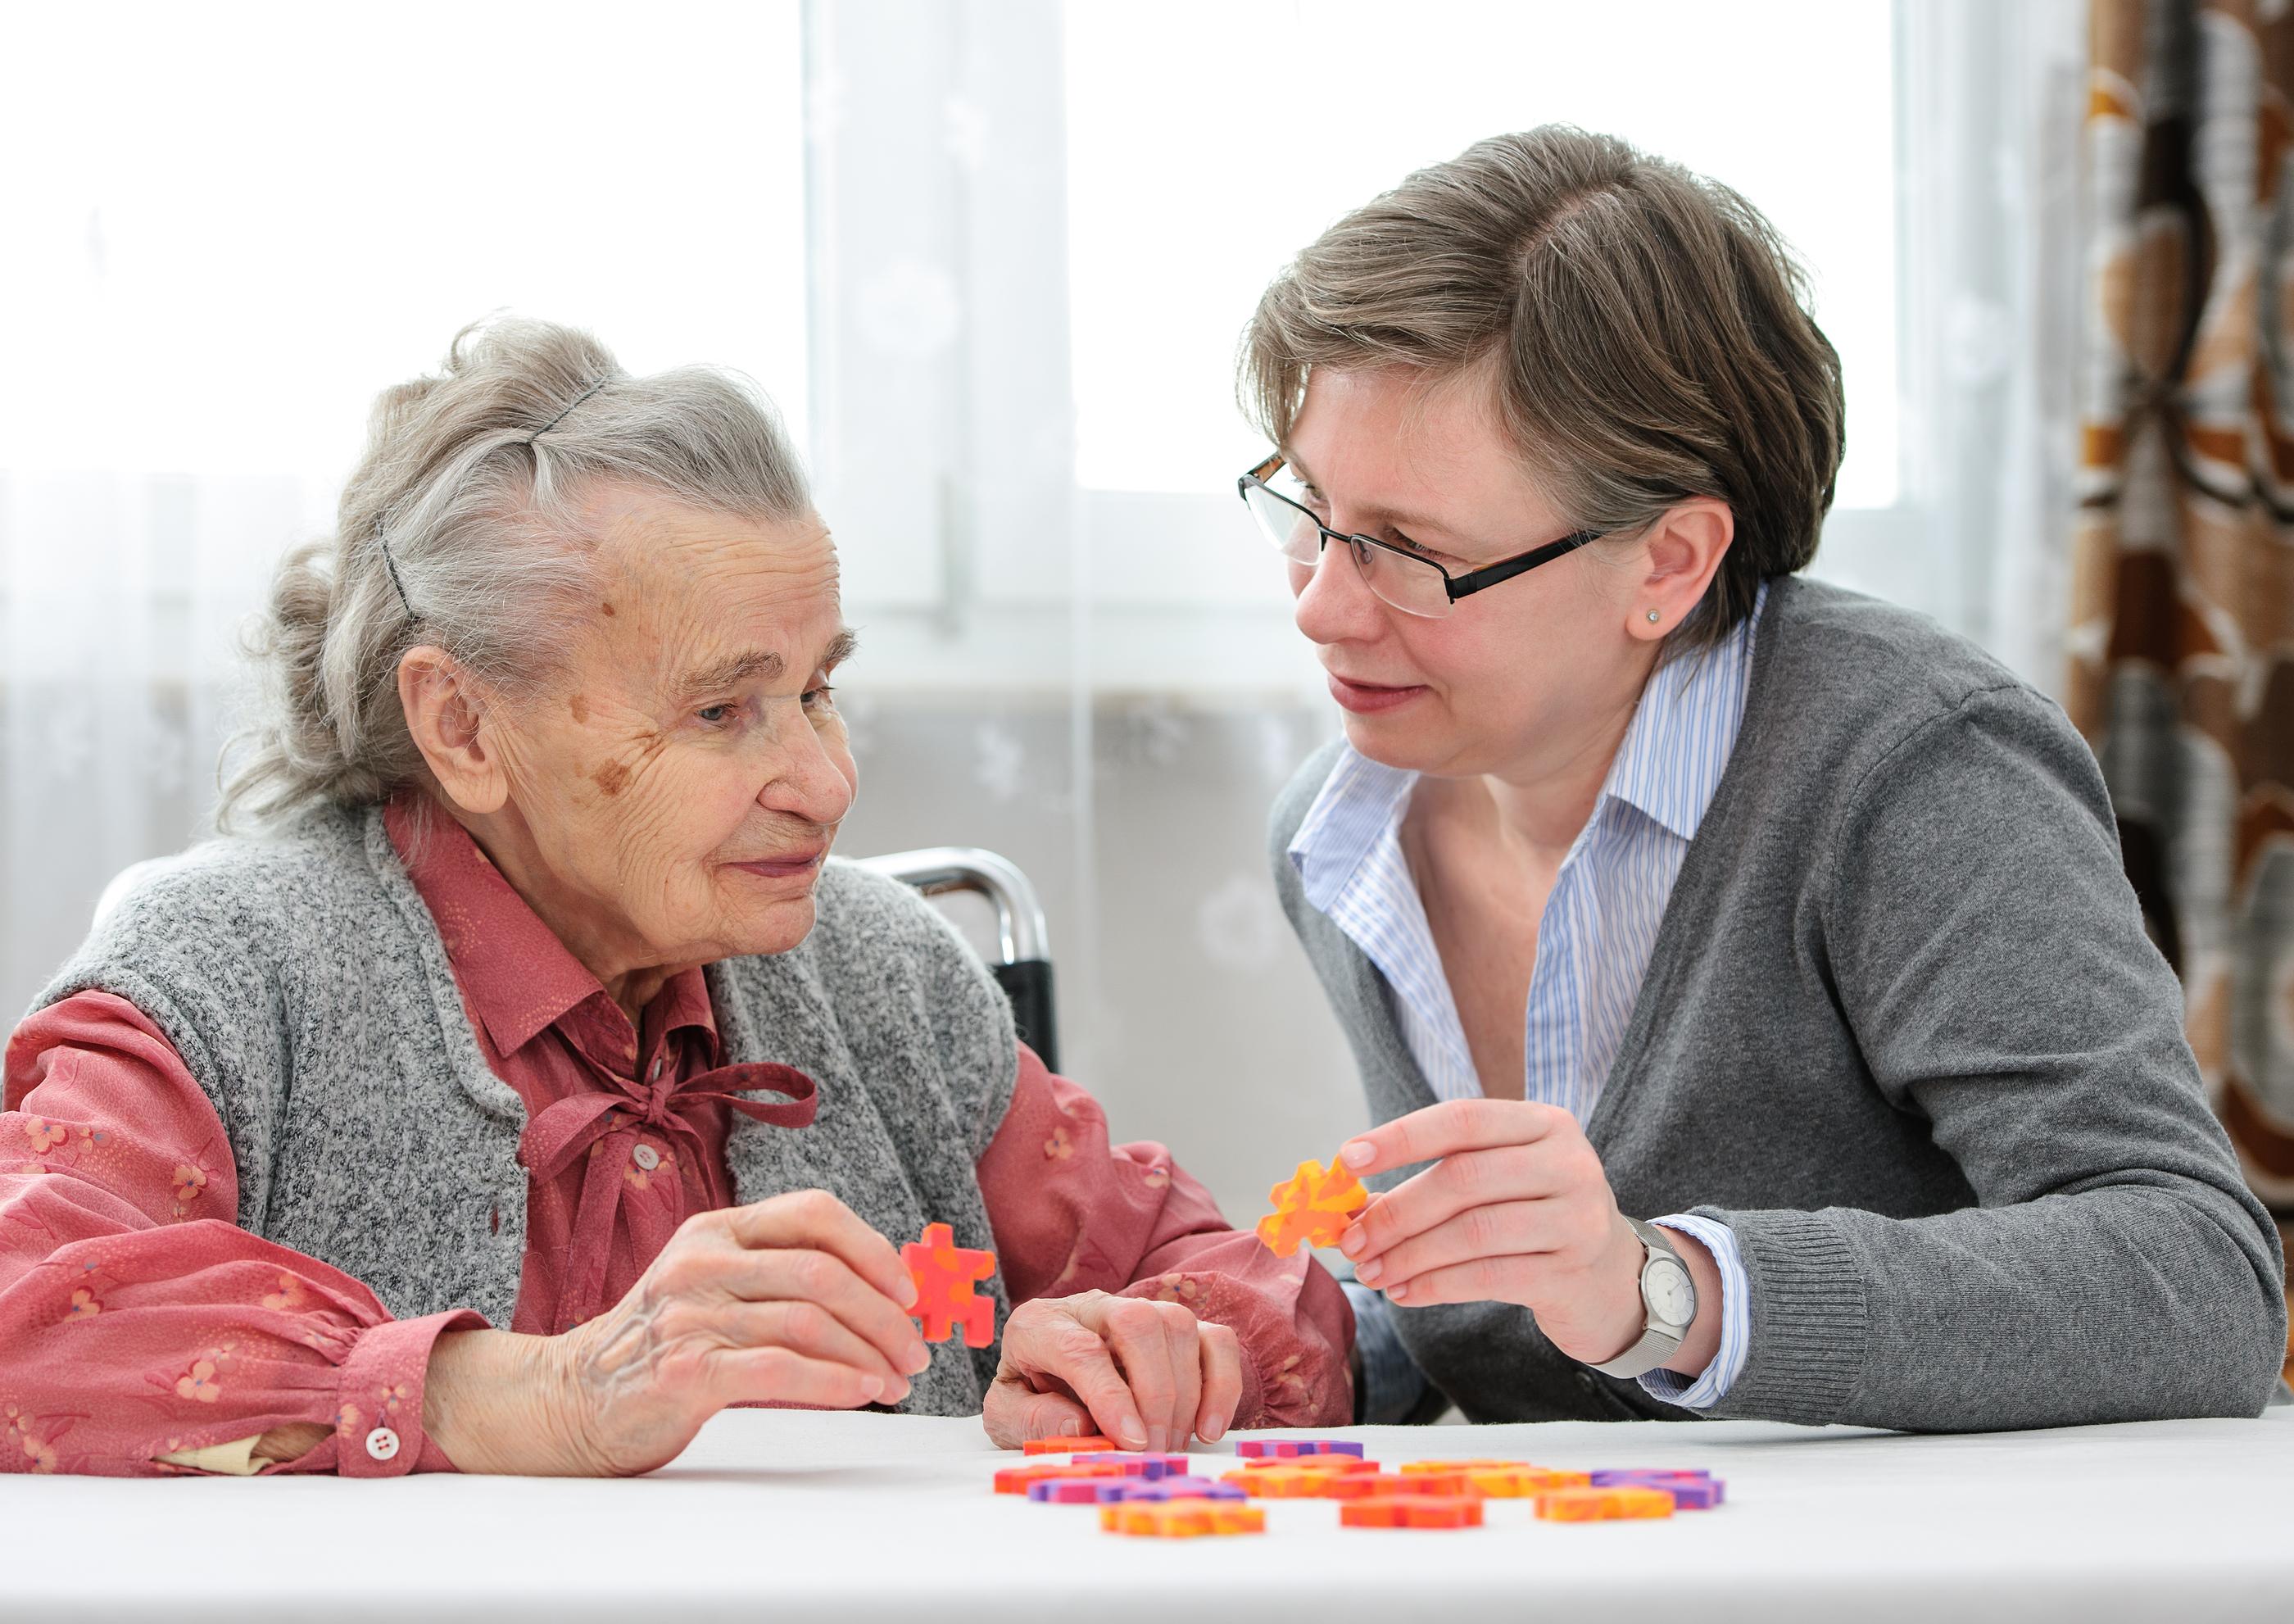 bigstock-Senior-Woman-With-Her-Elder-Ca-69141397